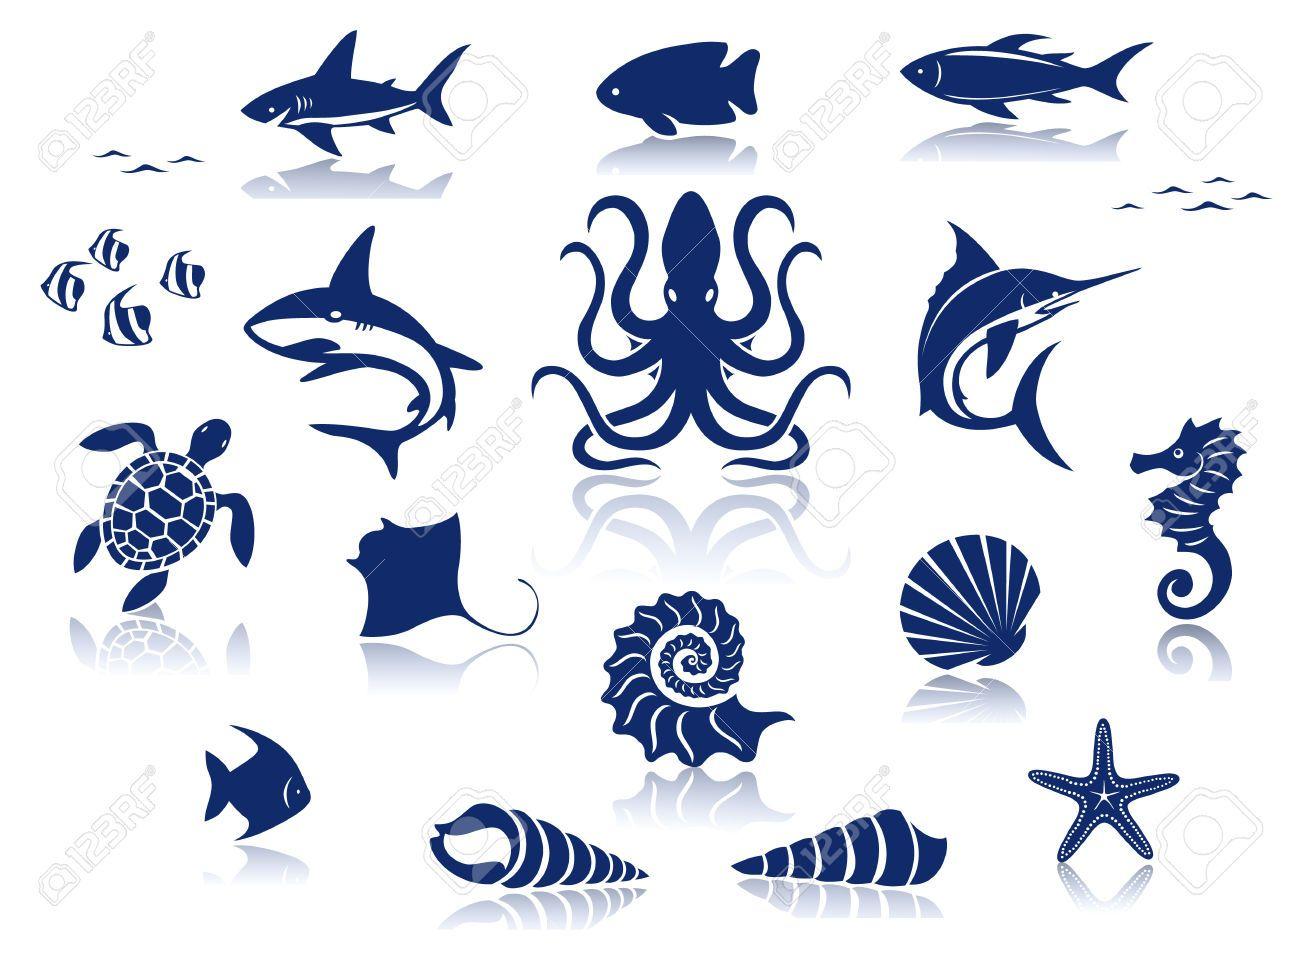 sea icons Google Search Reflection poster, Icon set